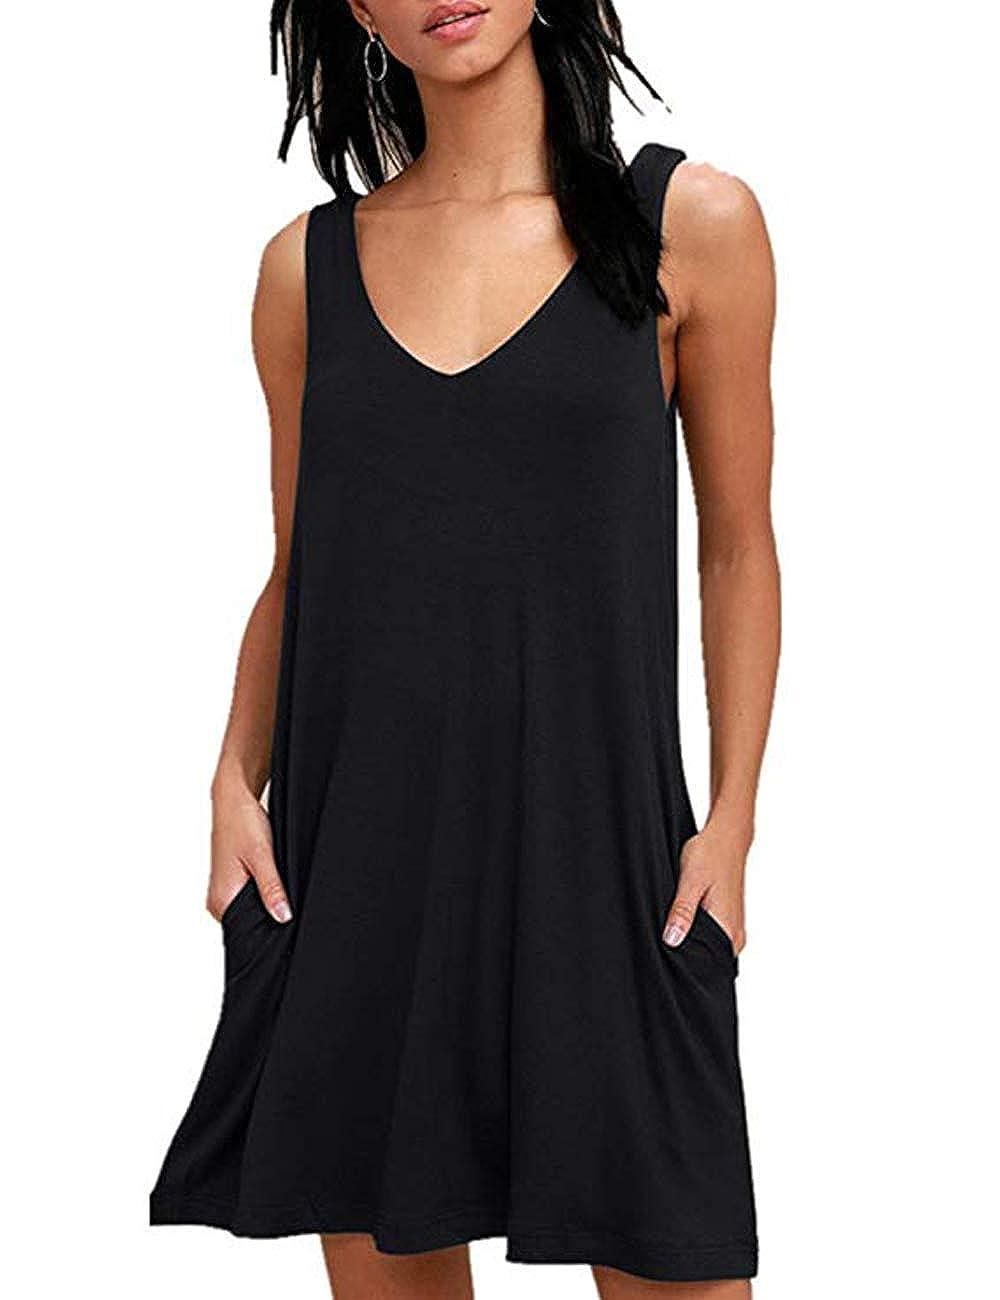 Black QIUYEJUO Women Summer Casual Sleeveless TShirt Mini Dress Beach Bikini Swimsuit Cover up with Pockets